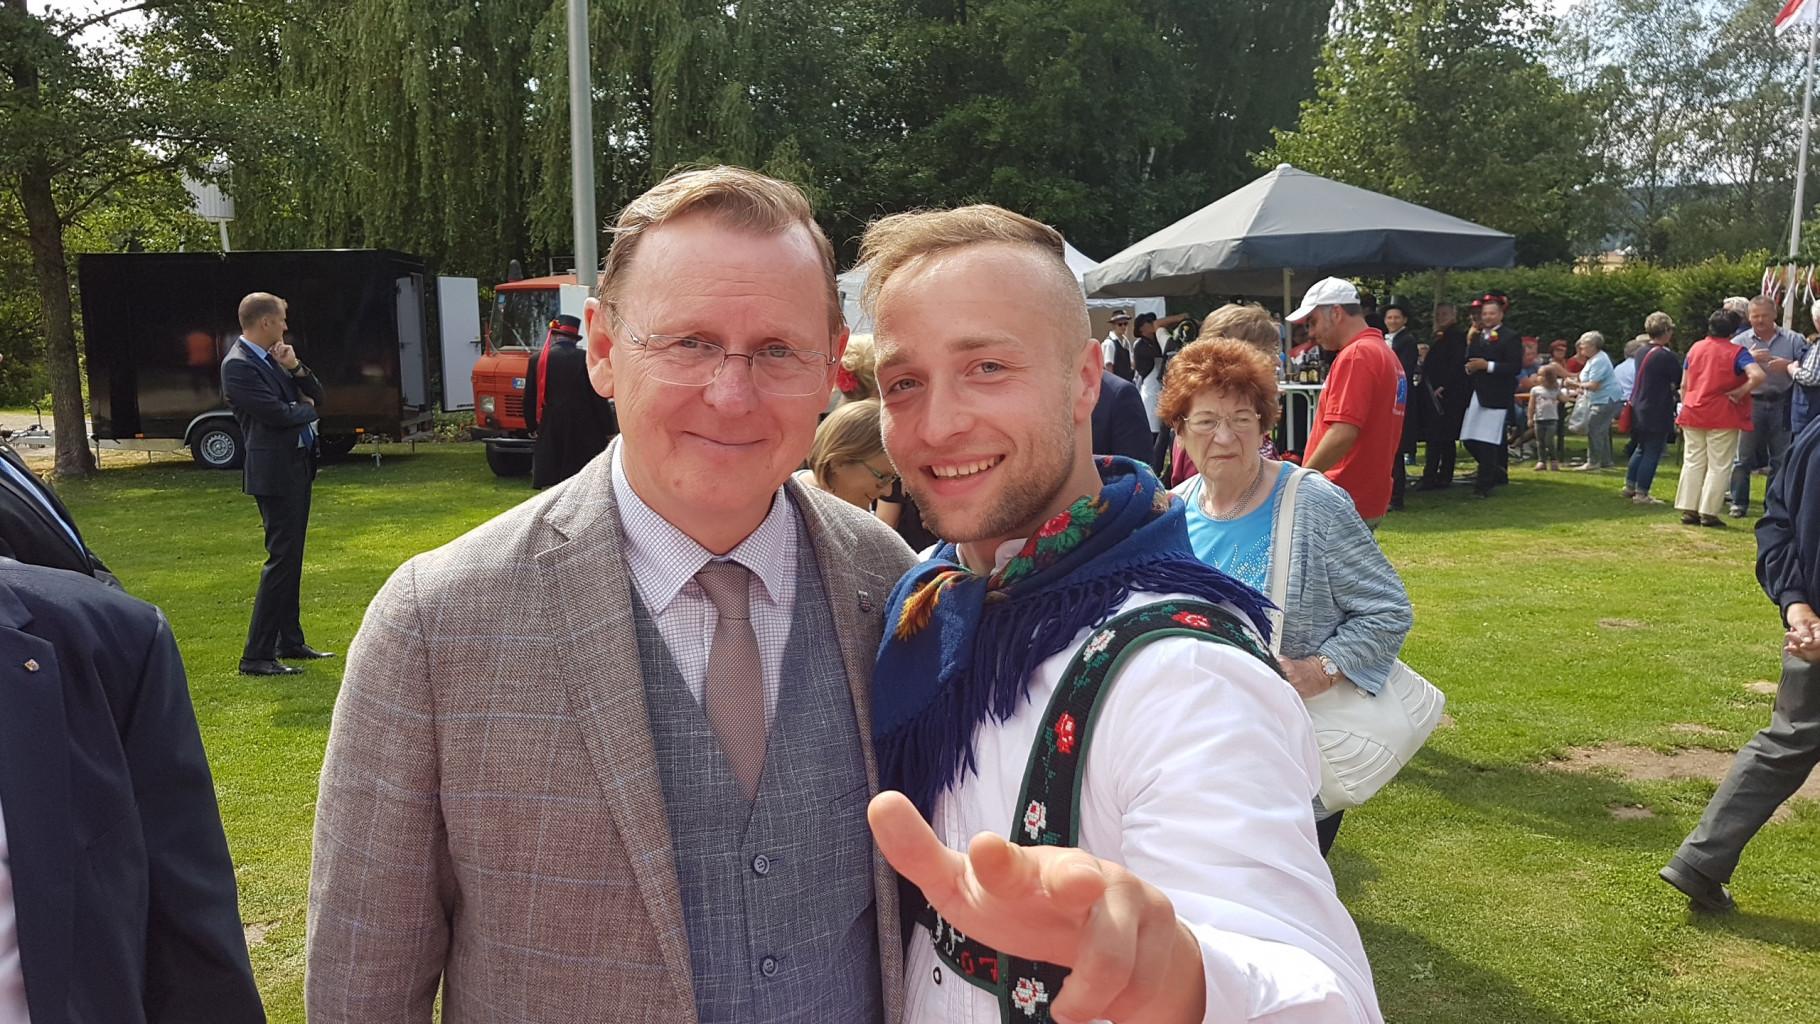 2019-07-07-Tag-d.Franken-Neustadt.Mit MP. B.Ramelow.-Fo.-O.D